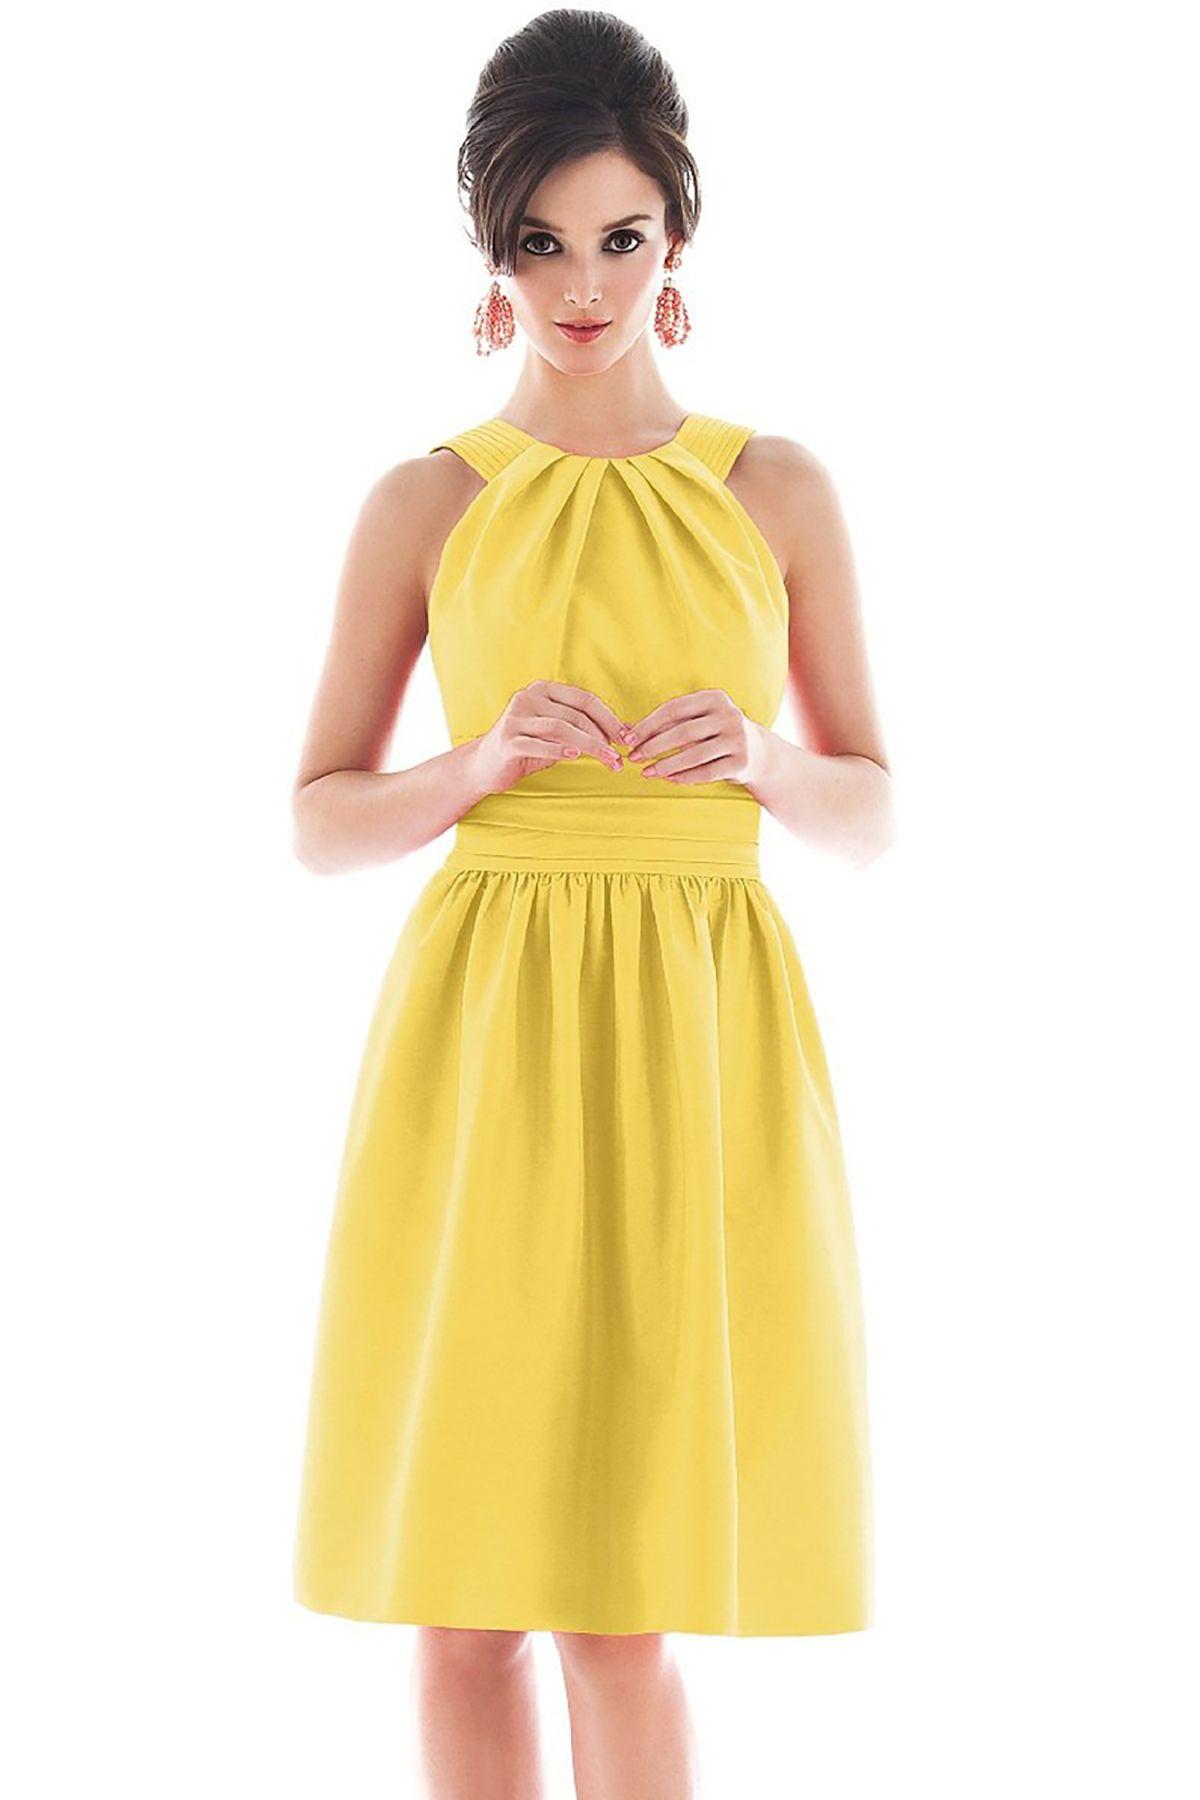 Shop alfred sung bridesmaid dress d494 in peau de soie at shop alfred sung bridesmaid dress d494 in peau de soie at weddington way find ombrellifo Choice Image